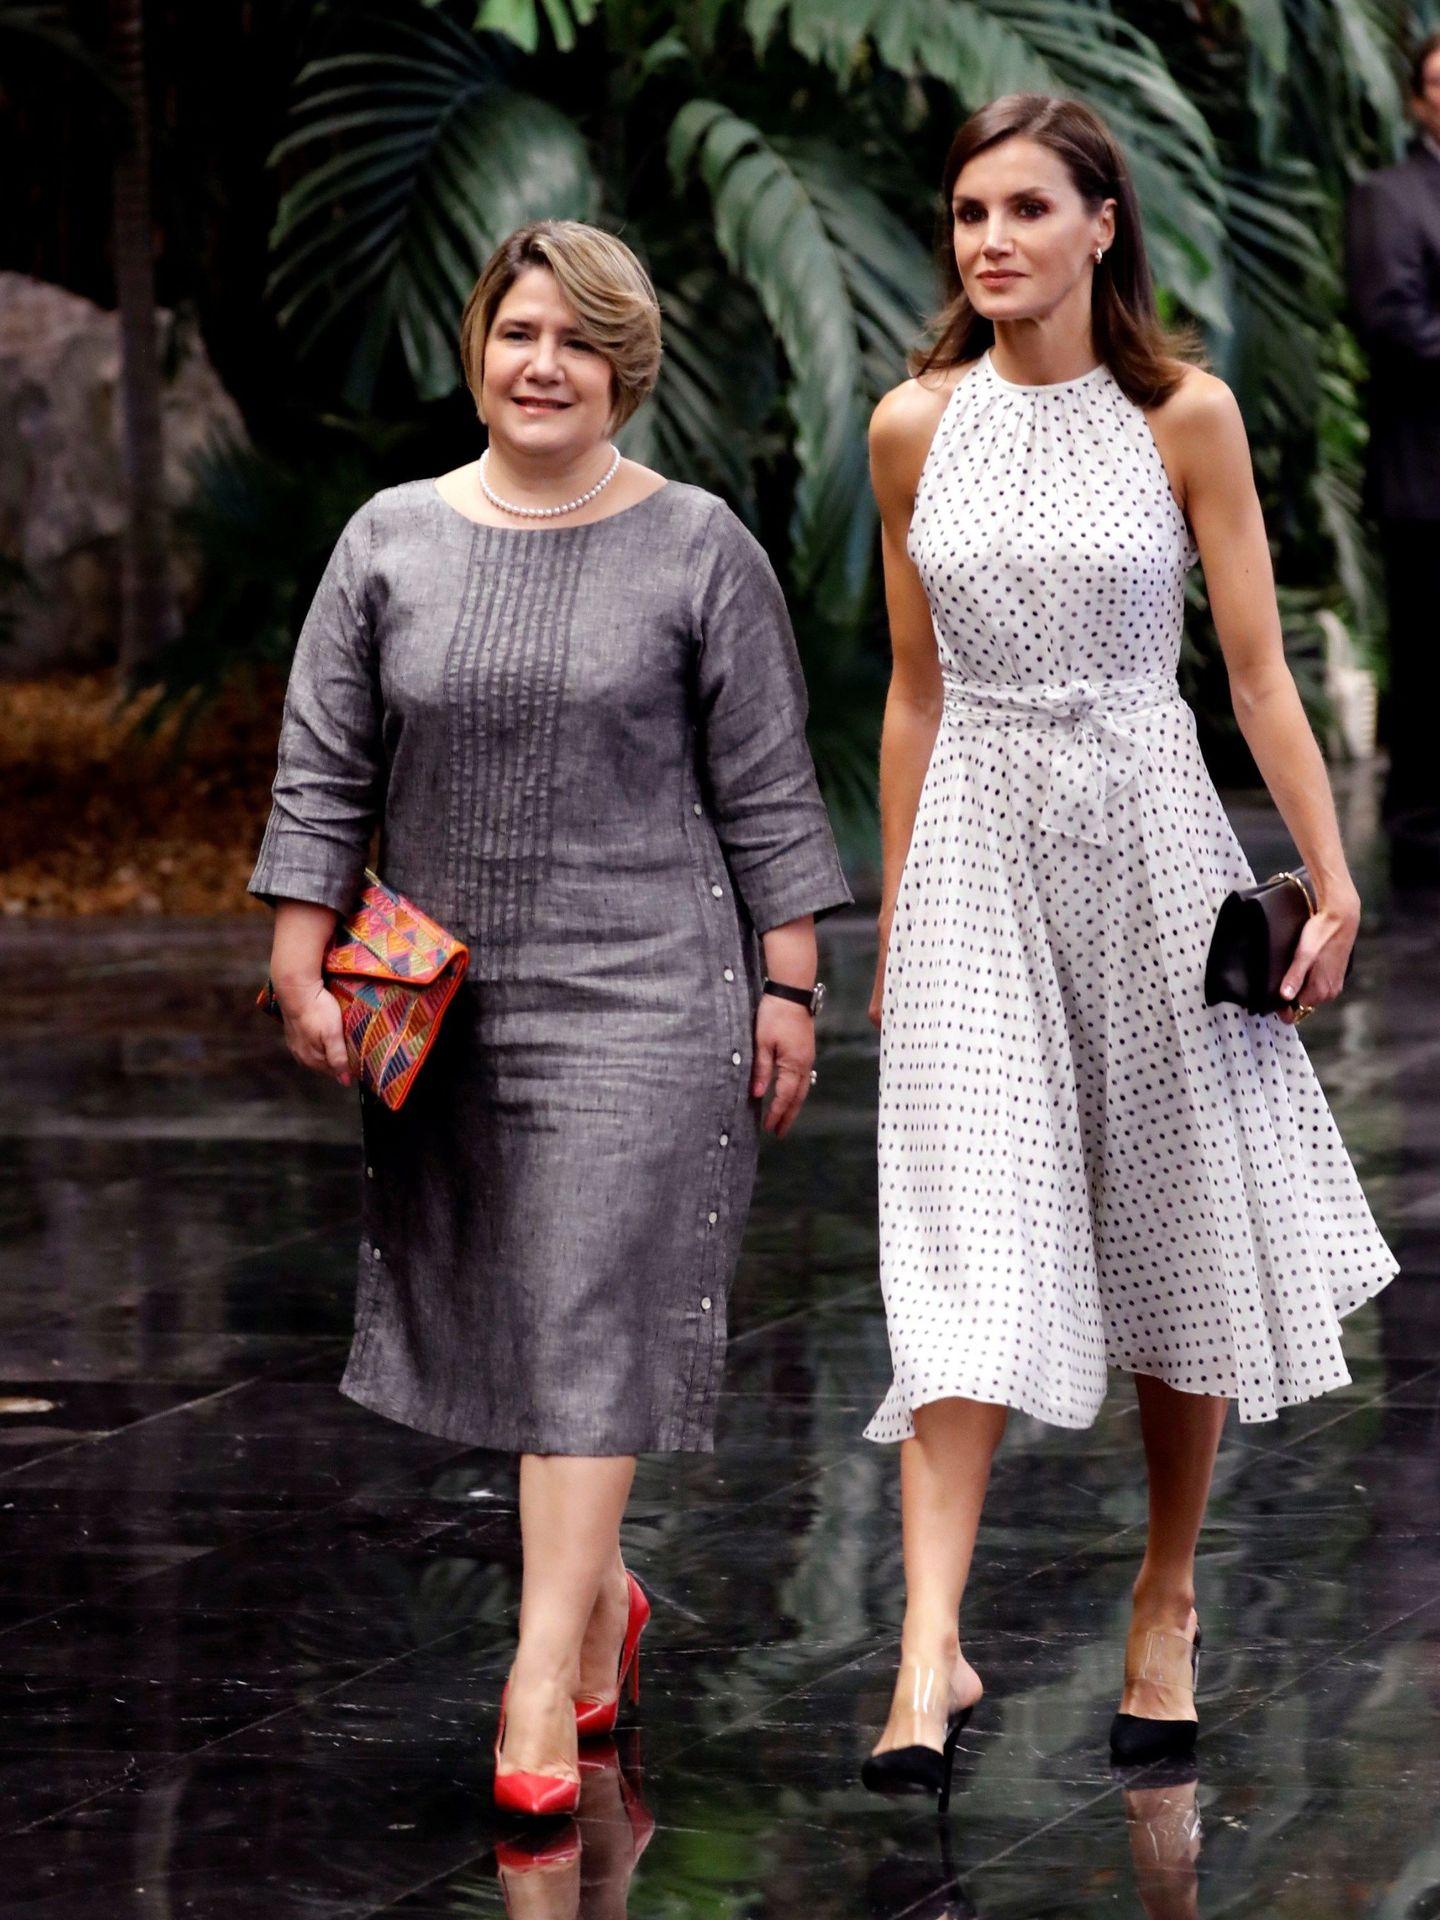 La Reina y la primera dama. (EFE)